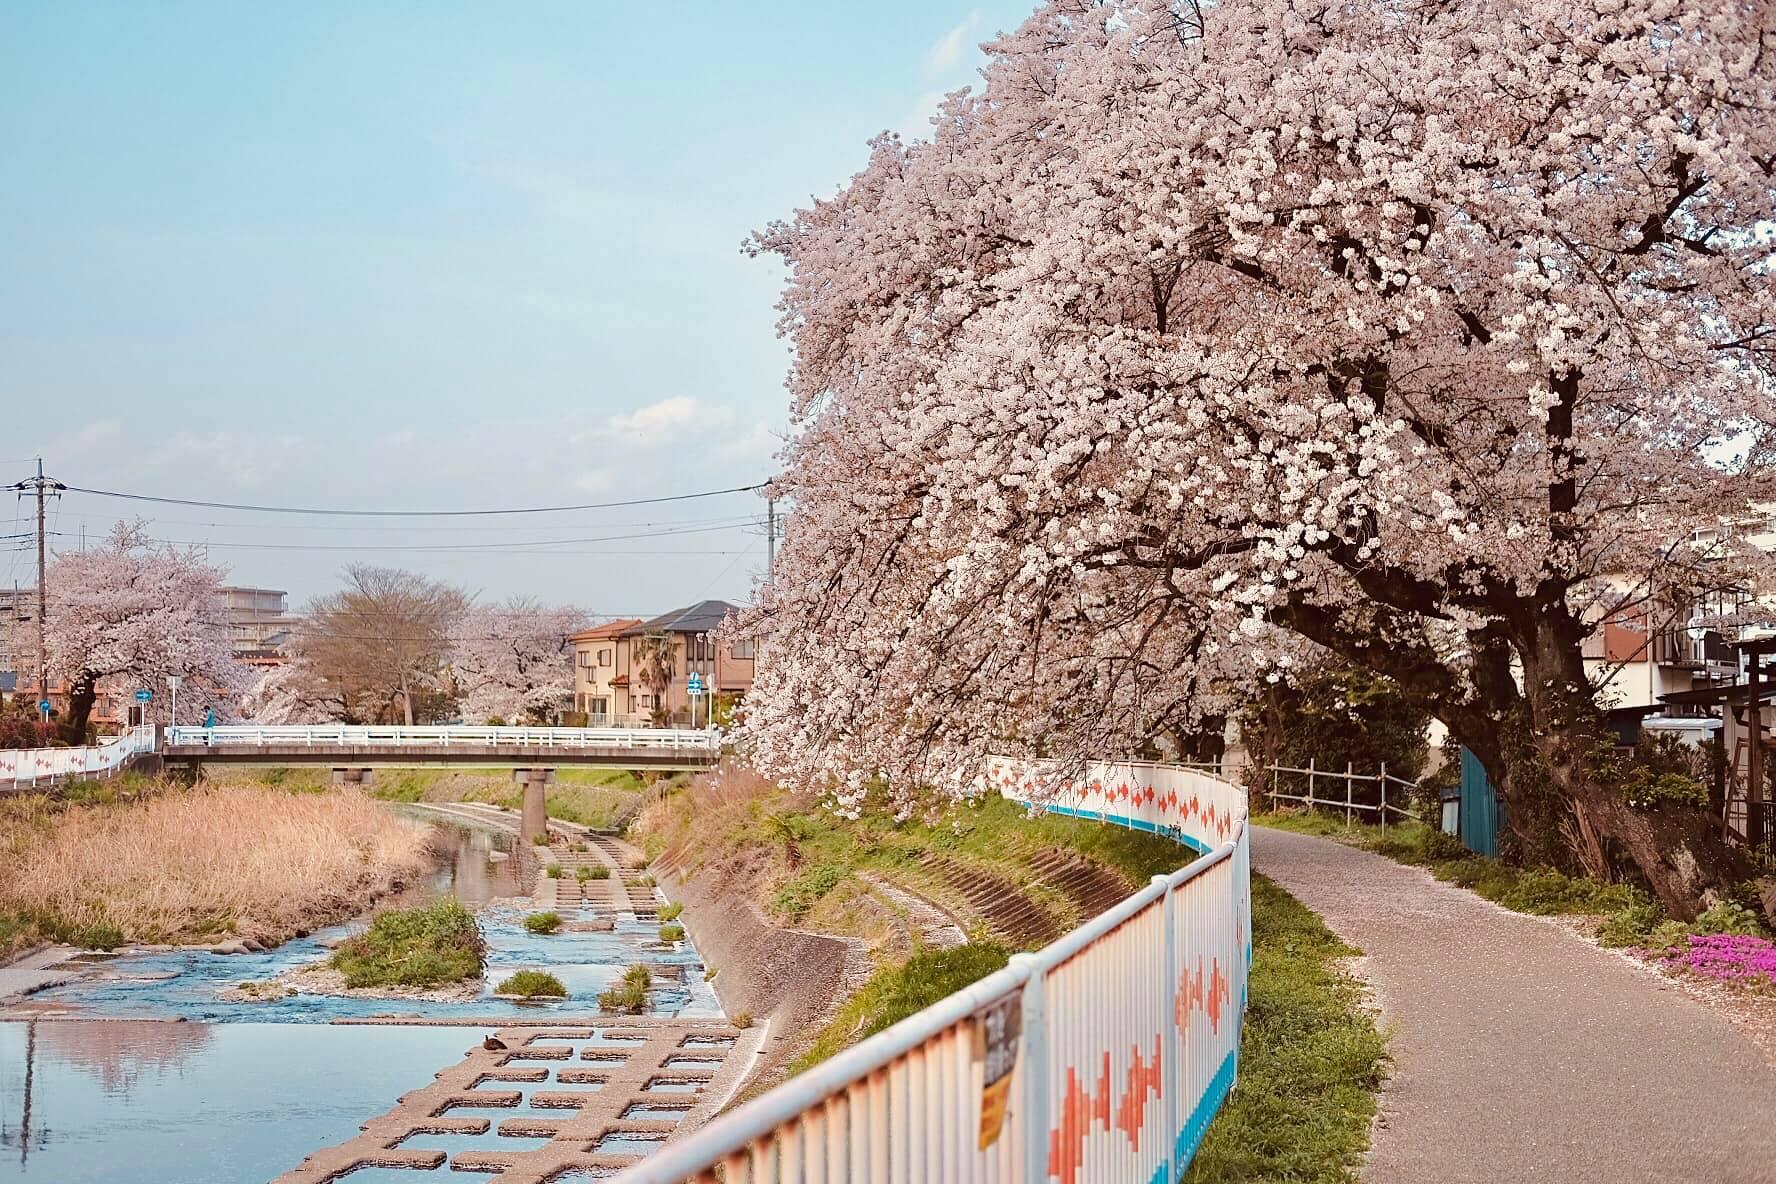 Cherry blossom season in Saitama, Japan